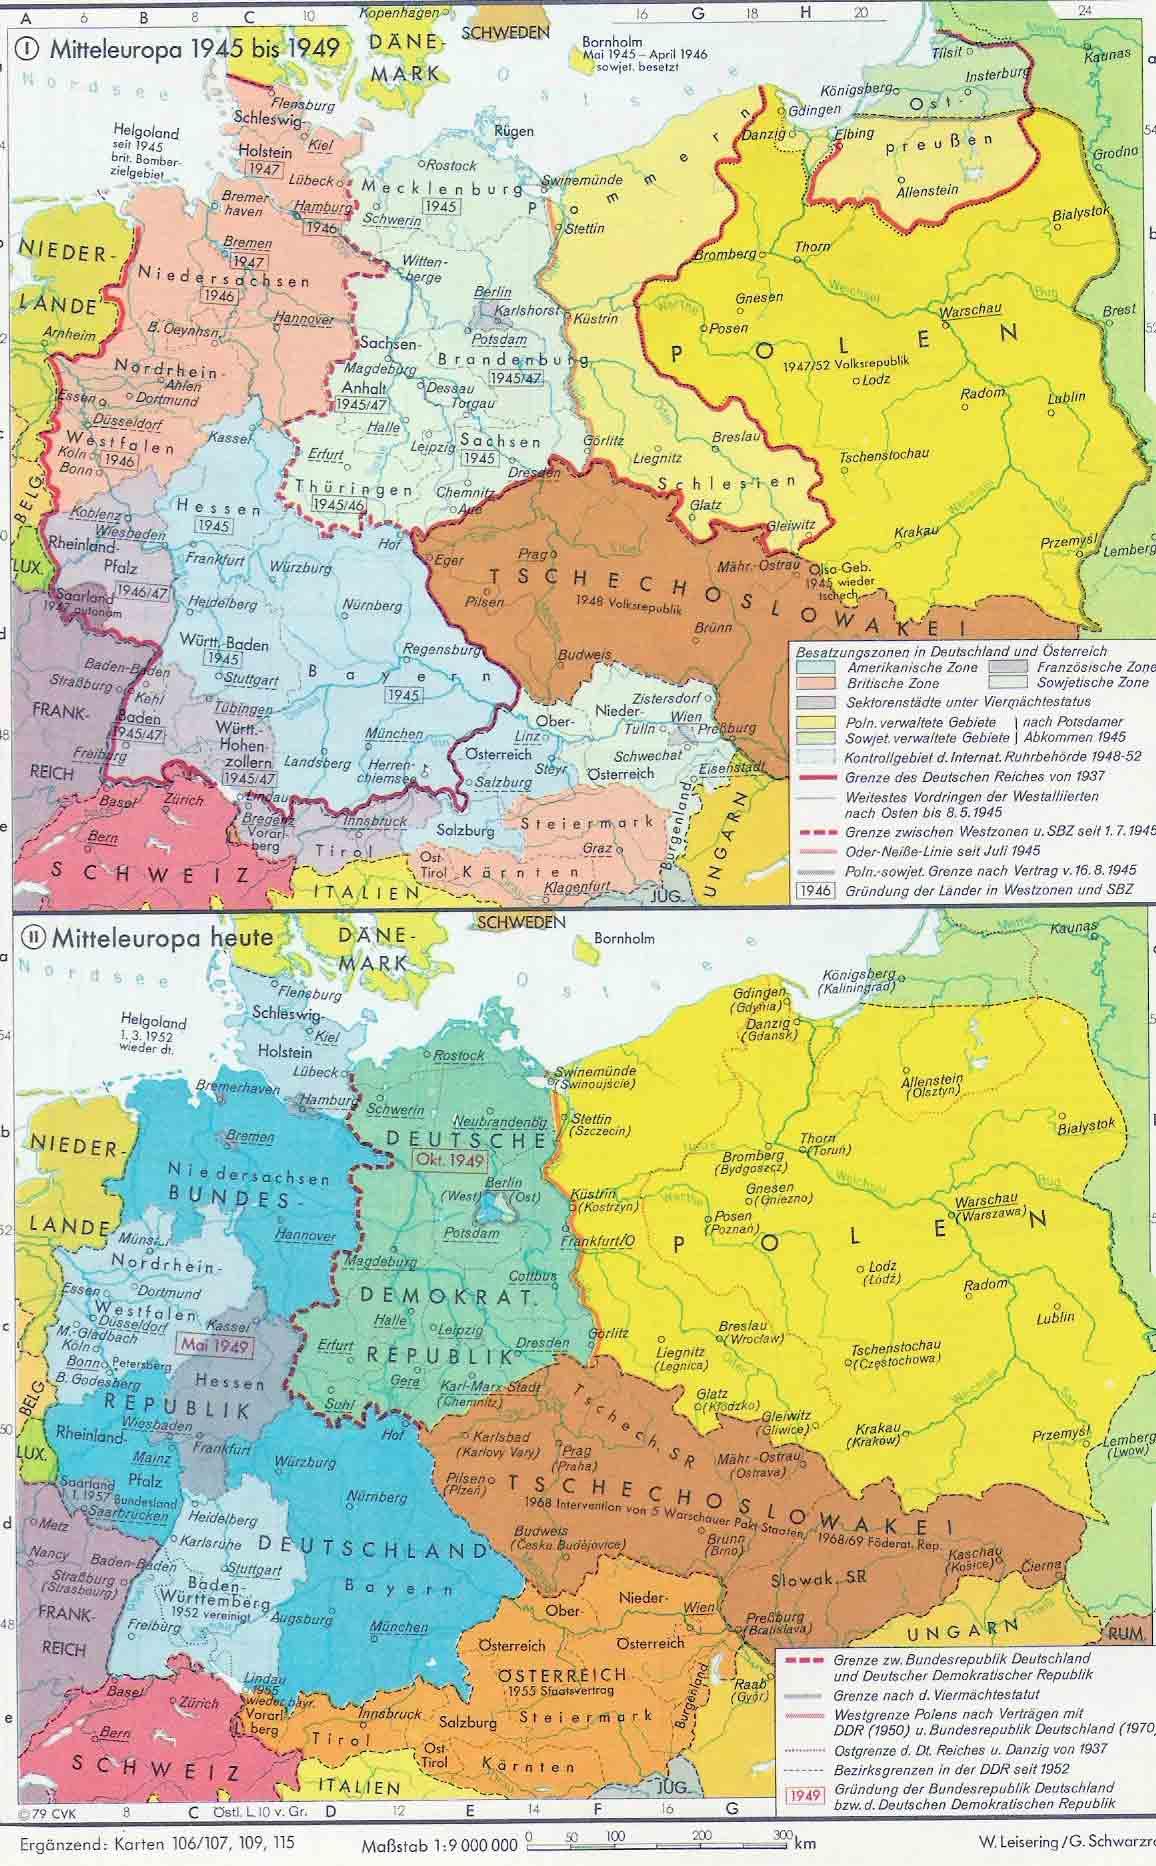 Países de Europa Central después de 1945